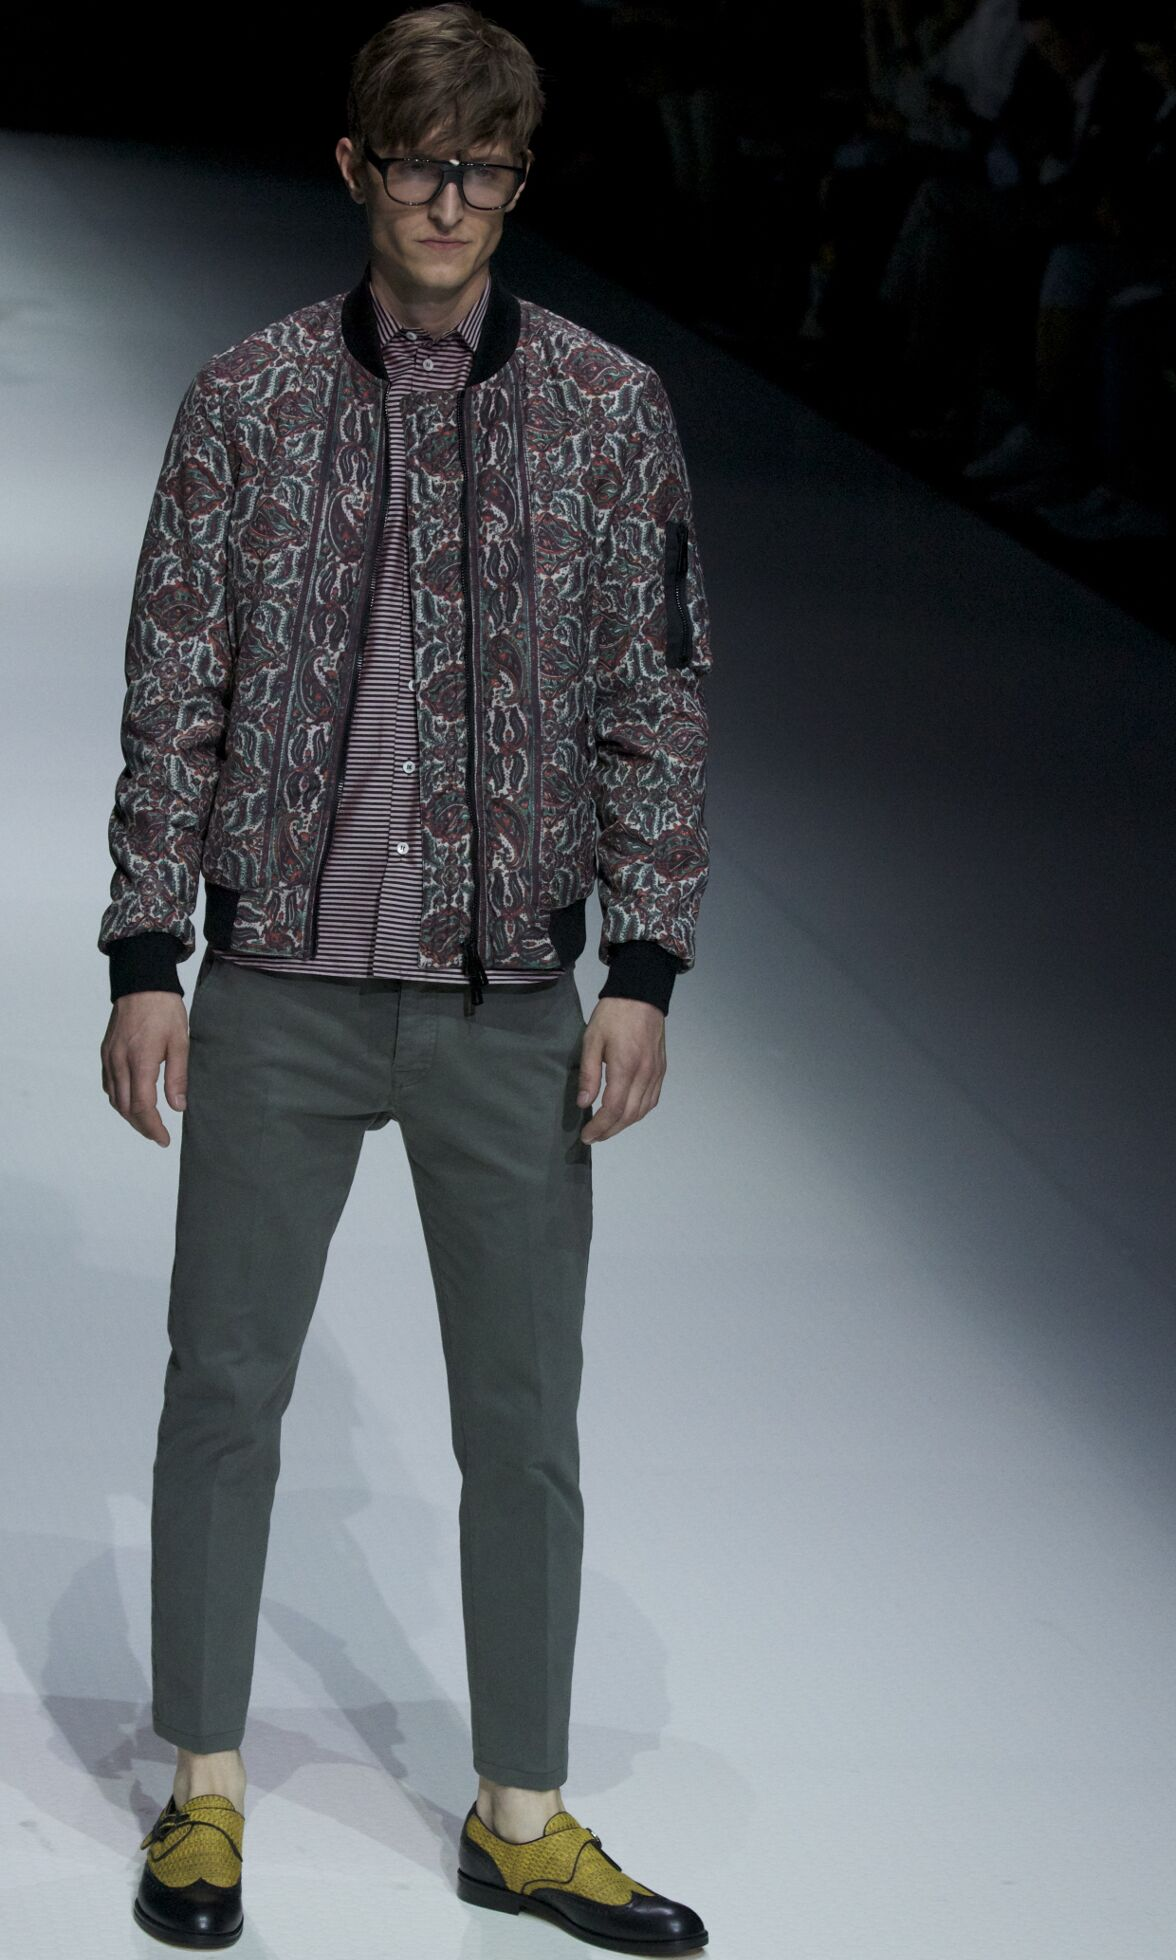 Fashion Man Model Andrea Pompilio Catwalk